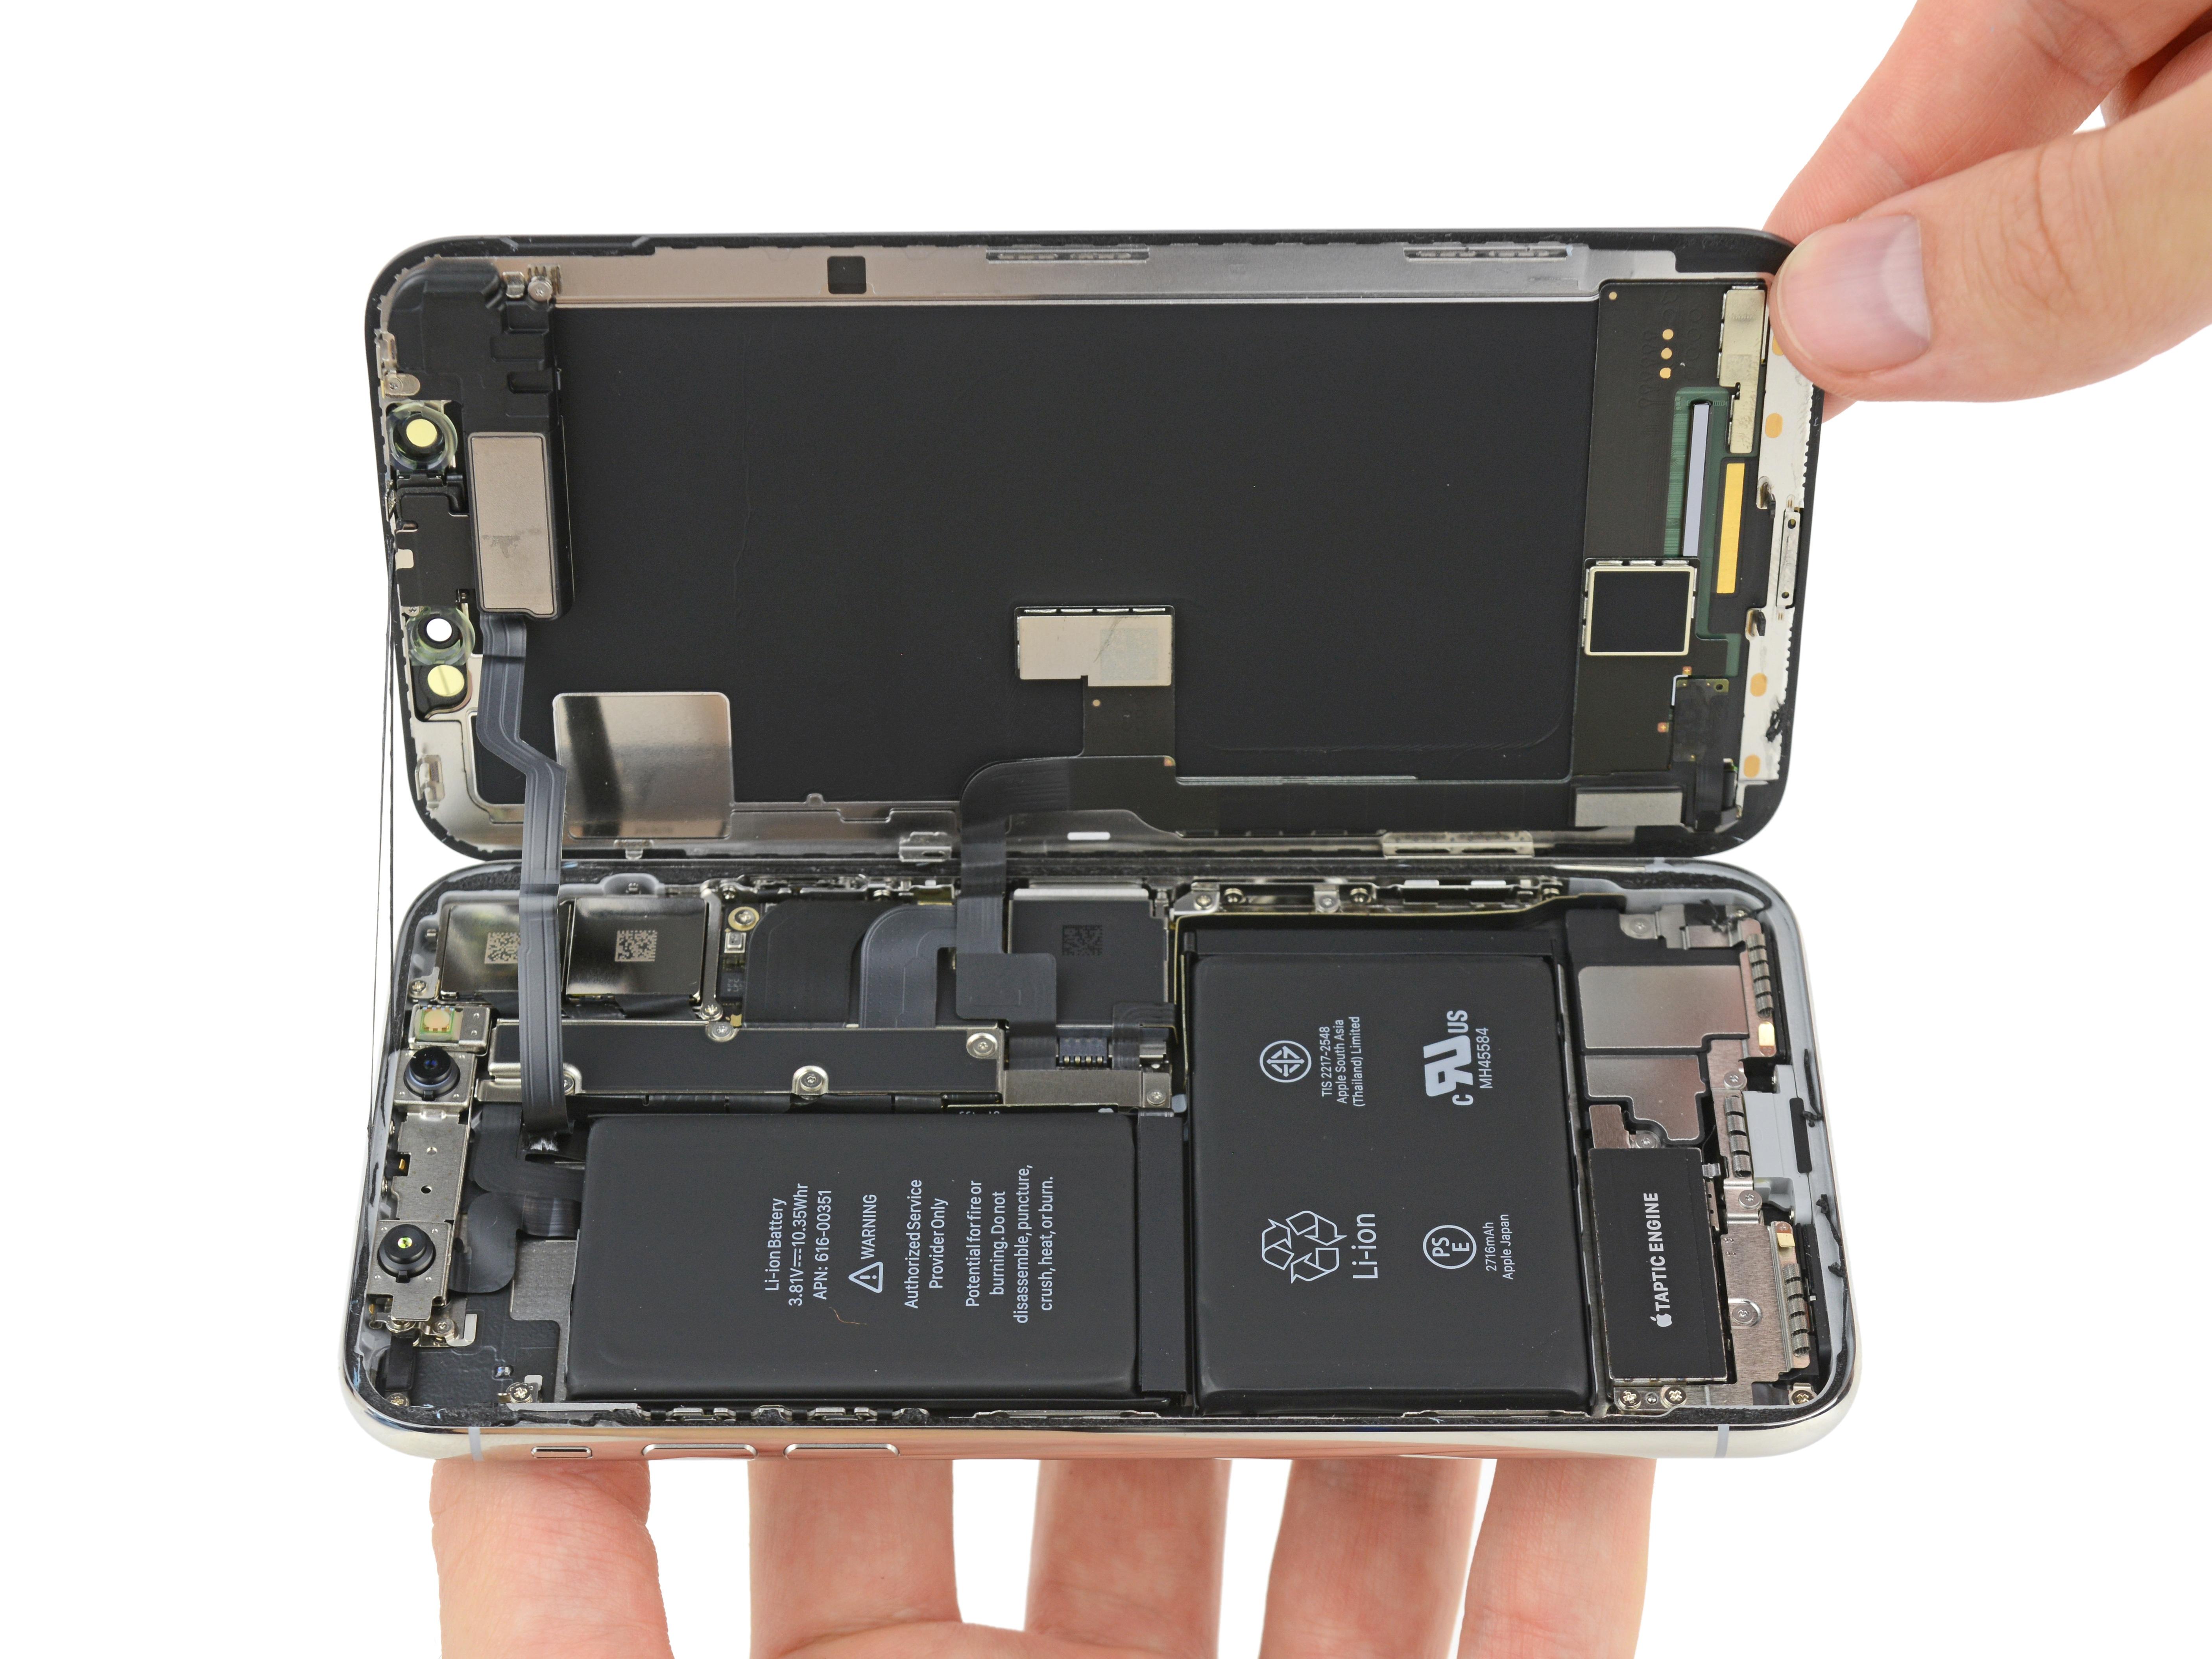 iPhone X desmontado pela iFixit